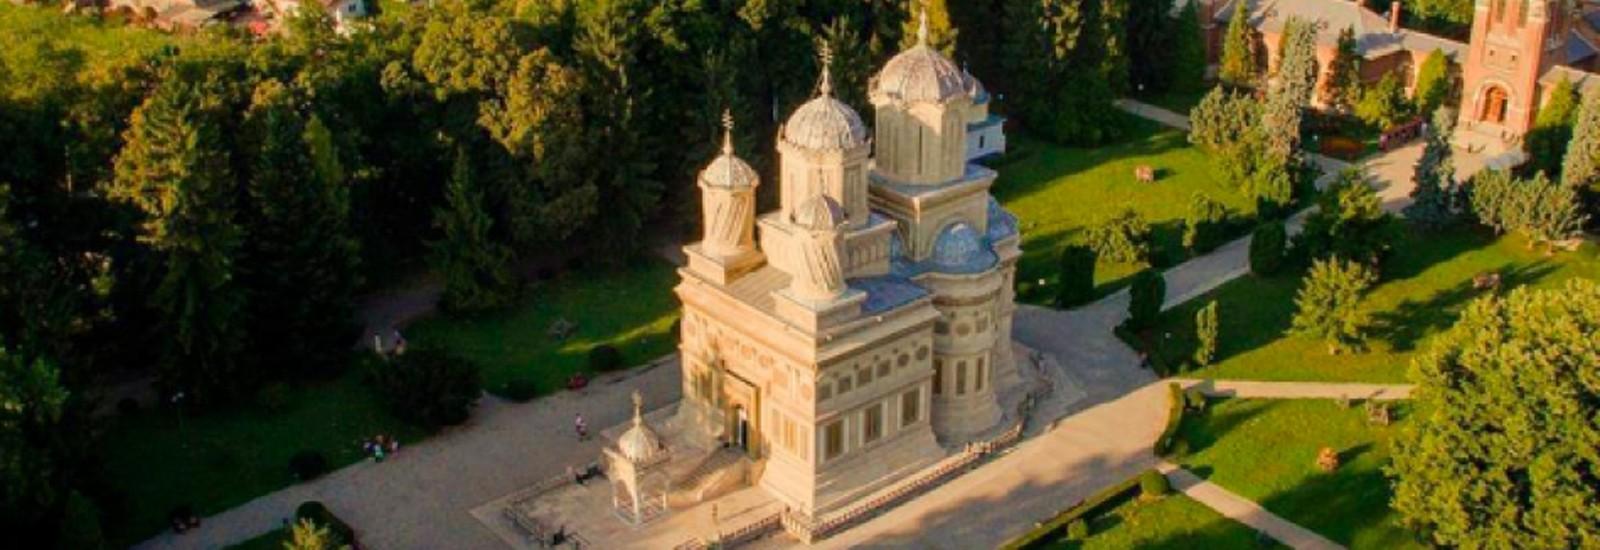 Tours in Romania blog